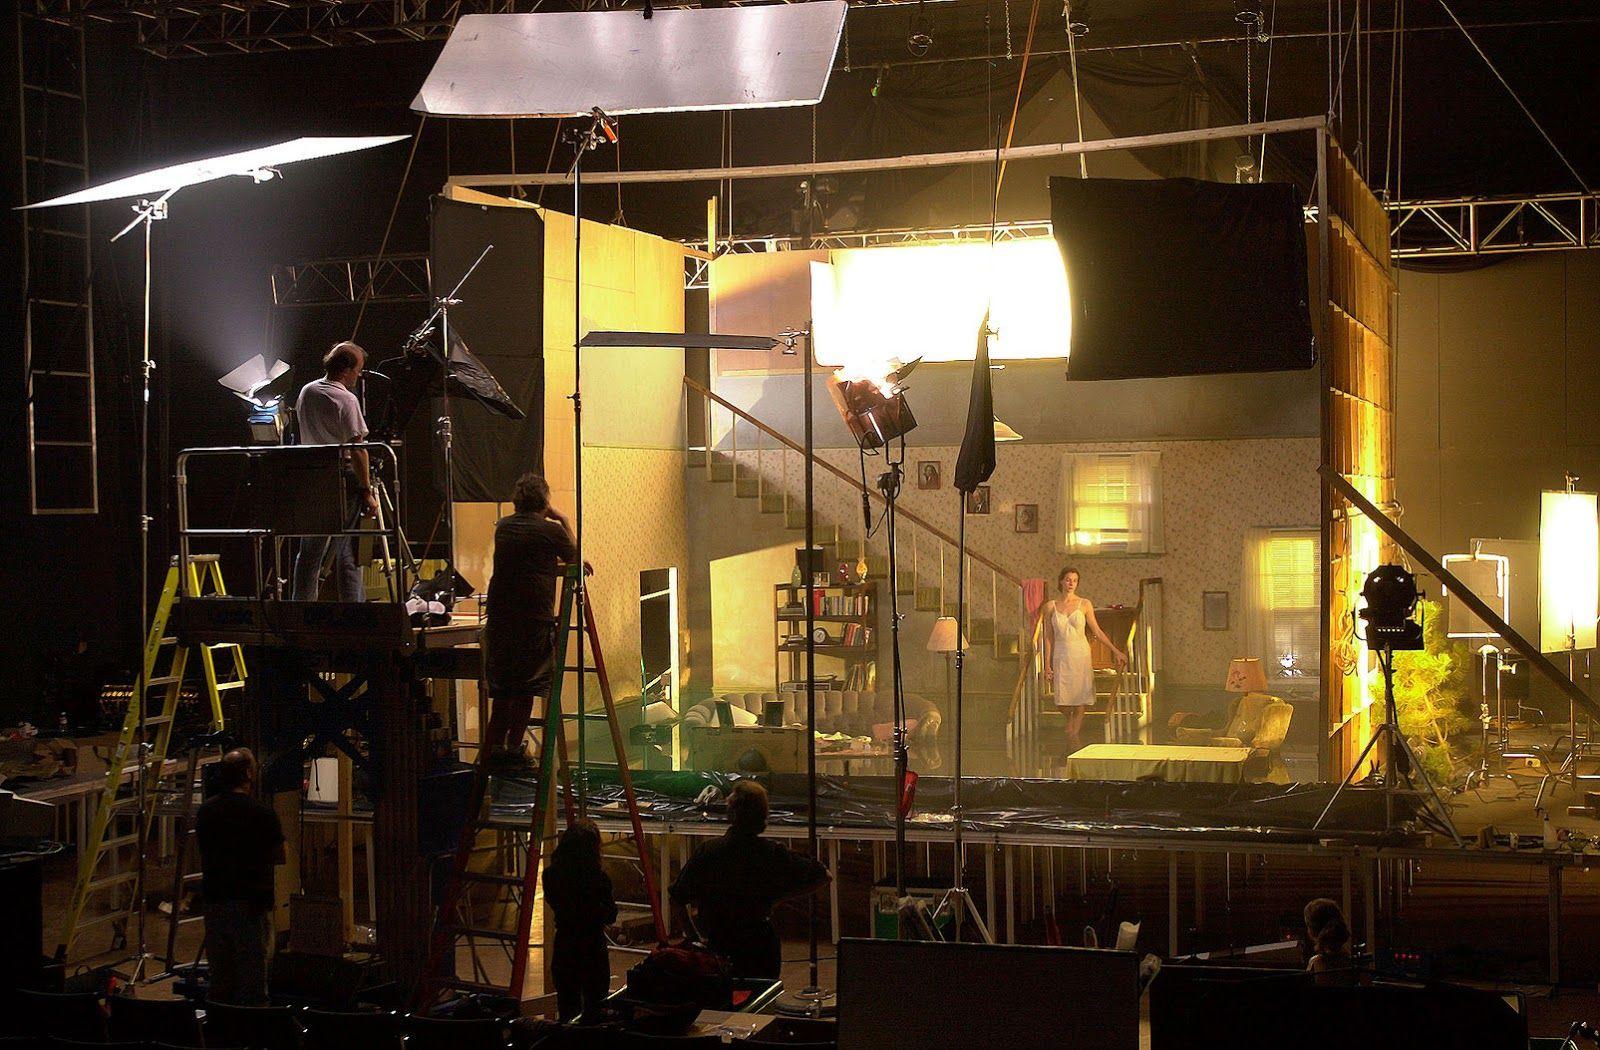 G crewdson gregory crewdson photography lighting setups lighting design still photography light